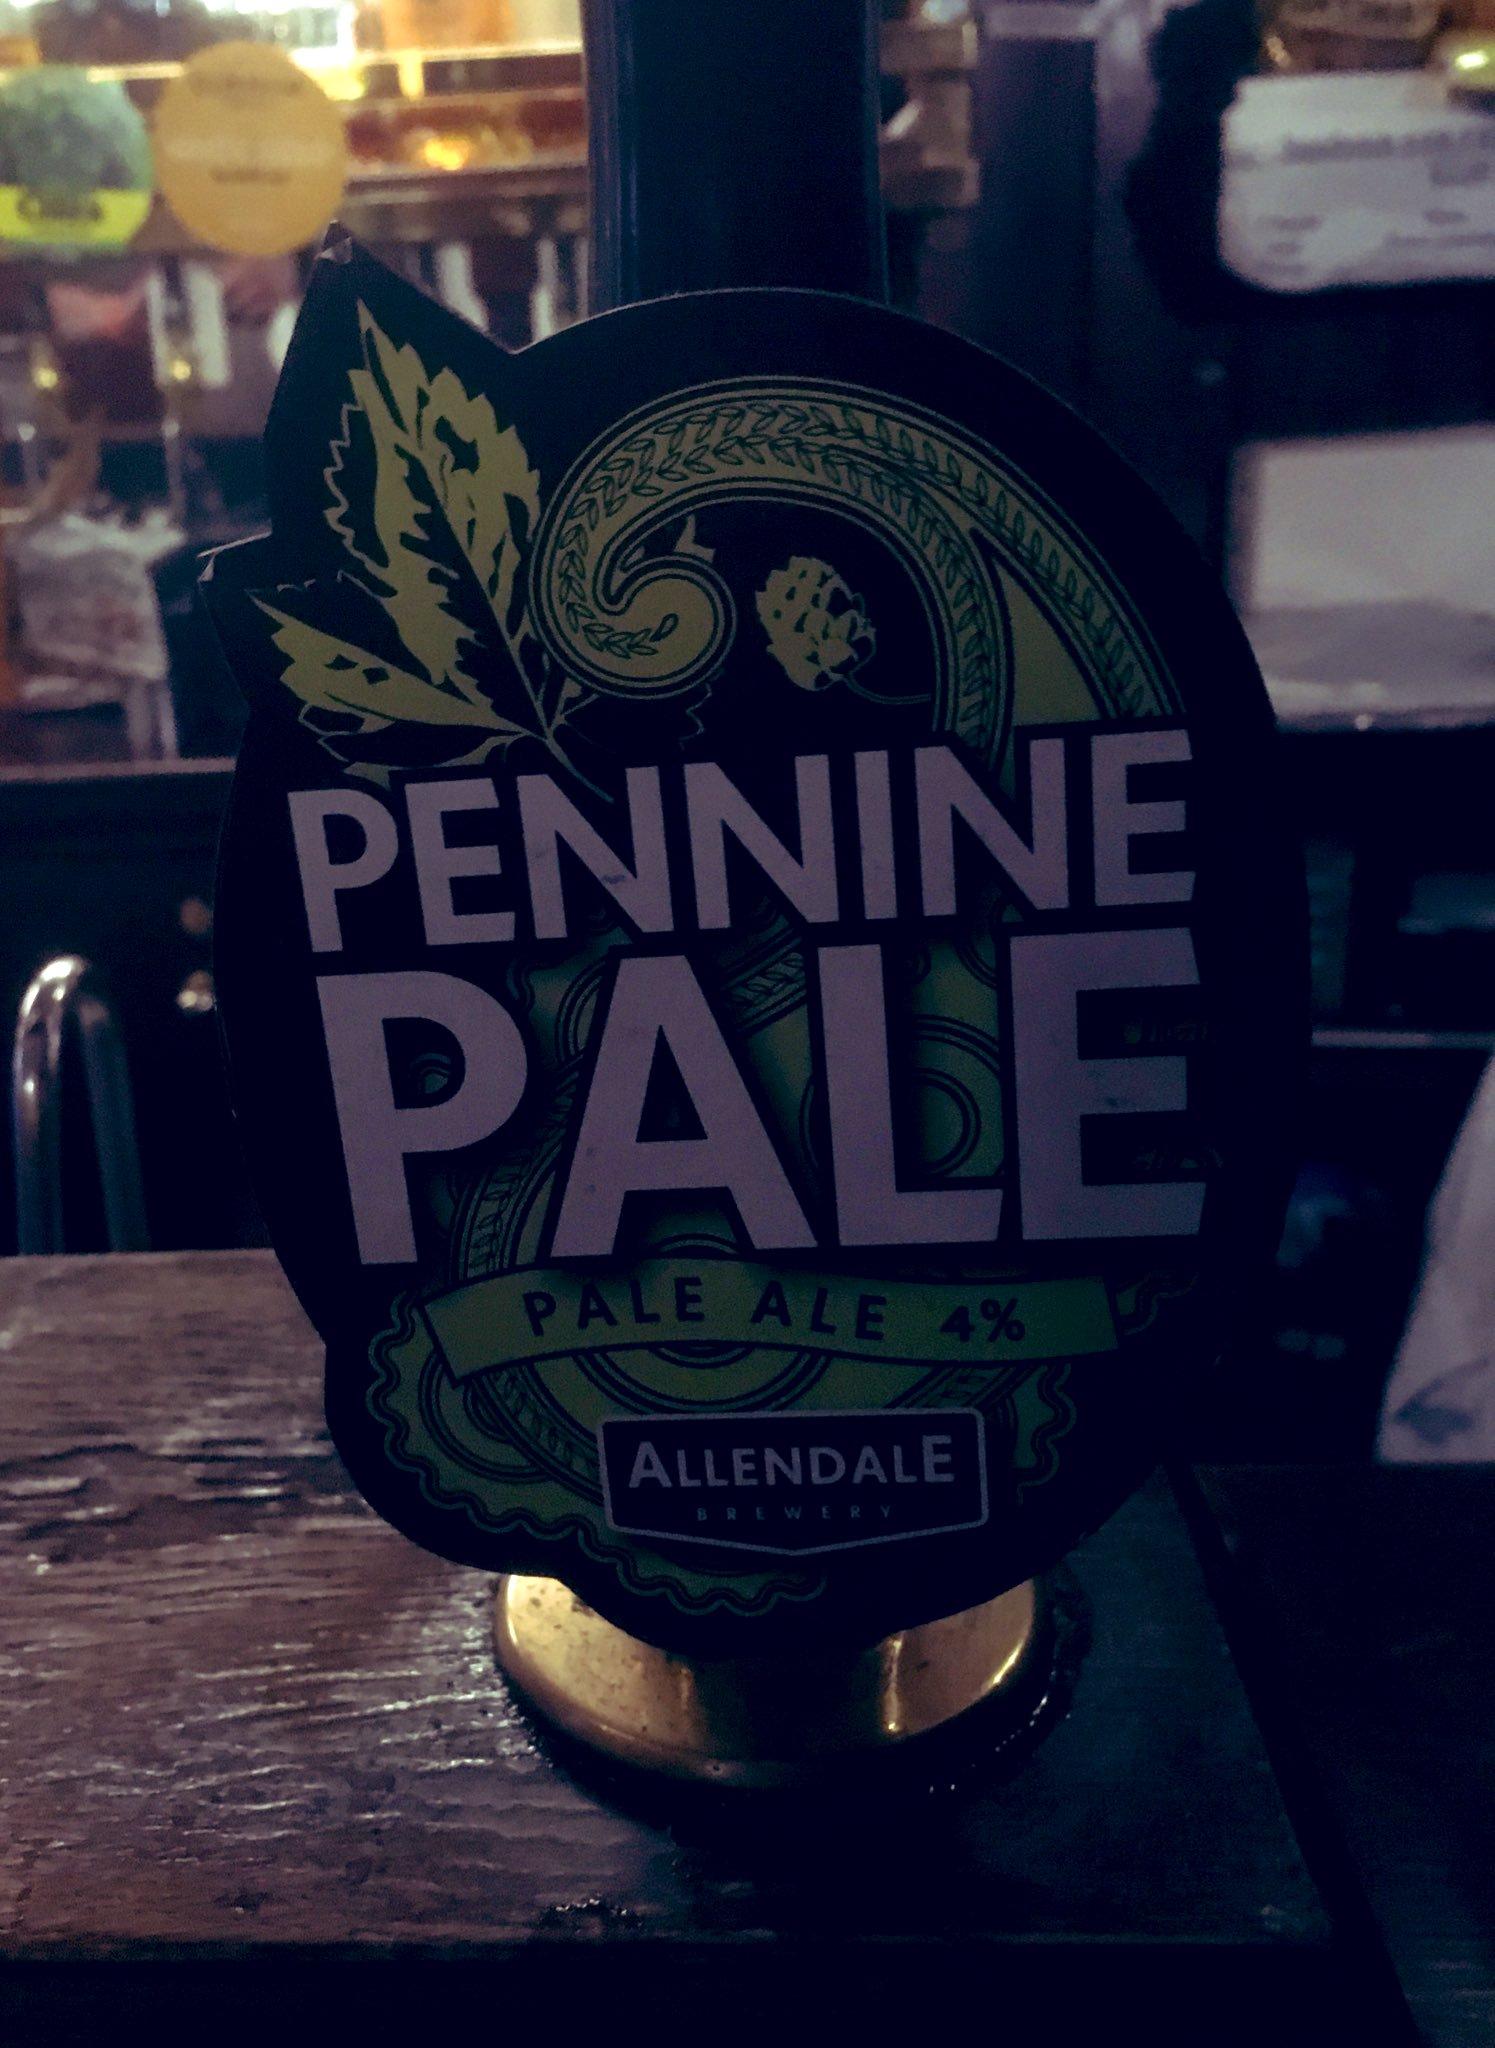 272: Pennine Pale